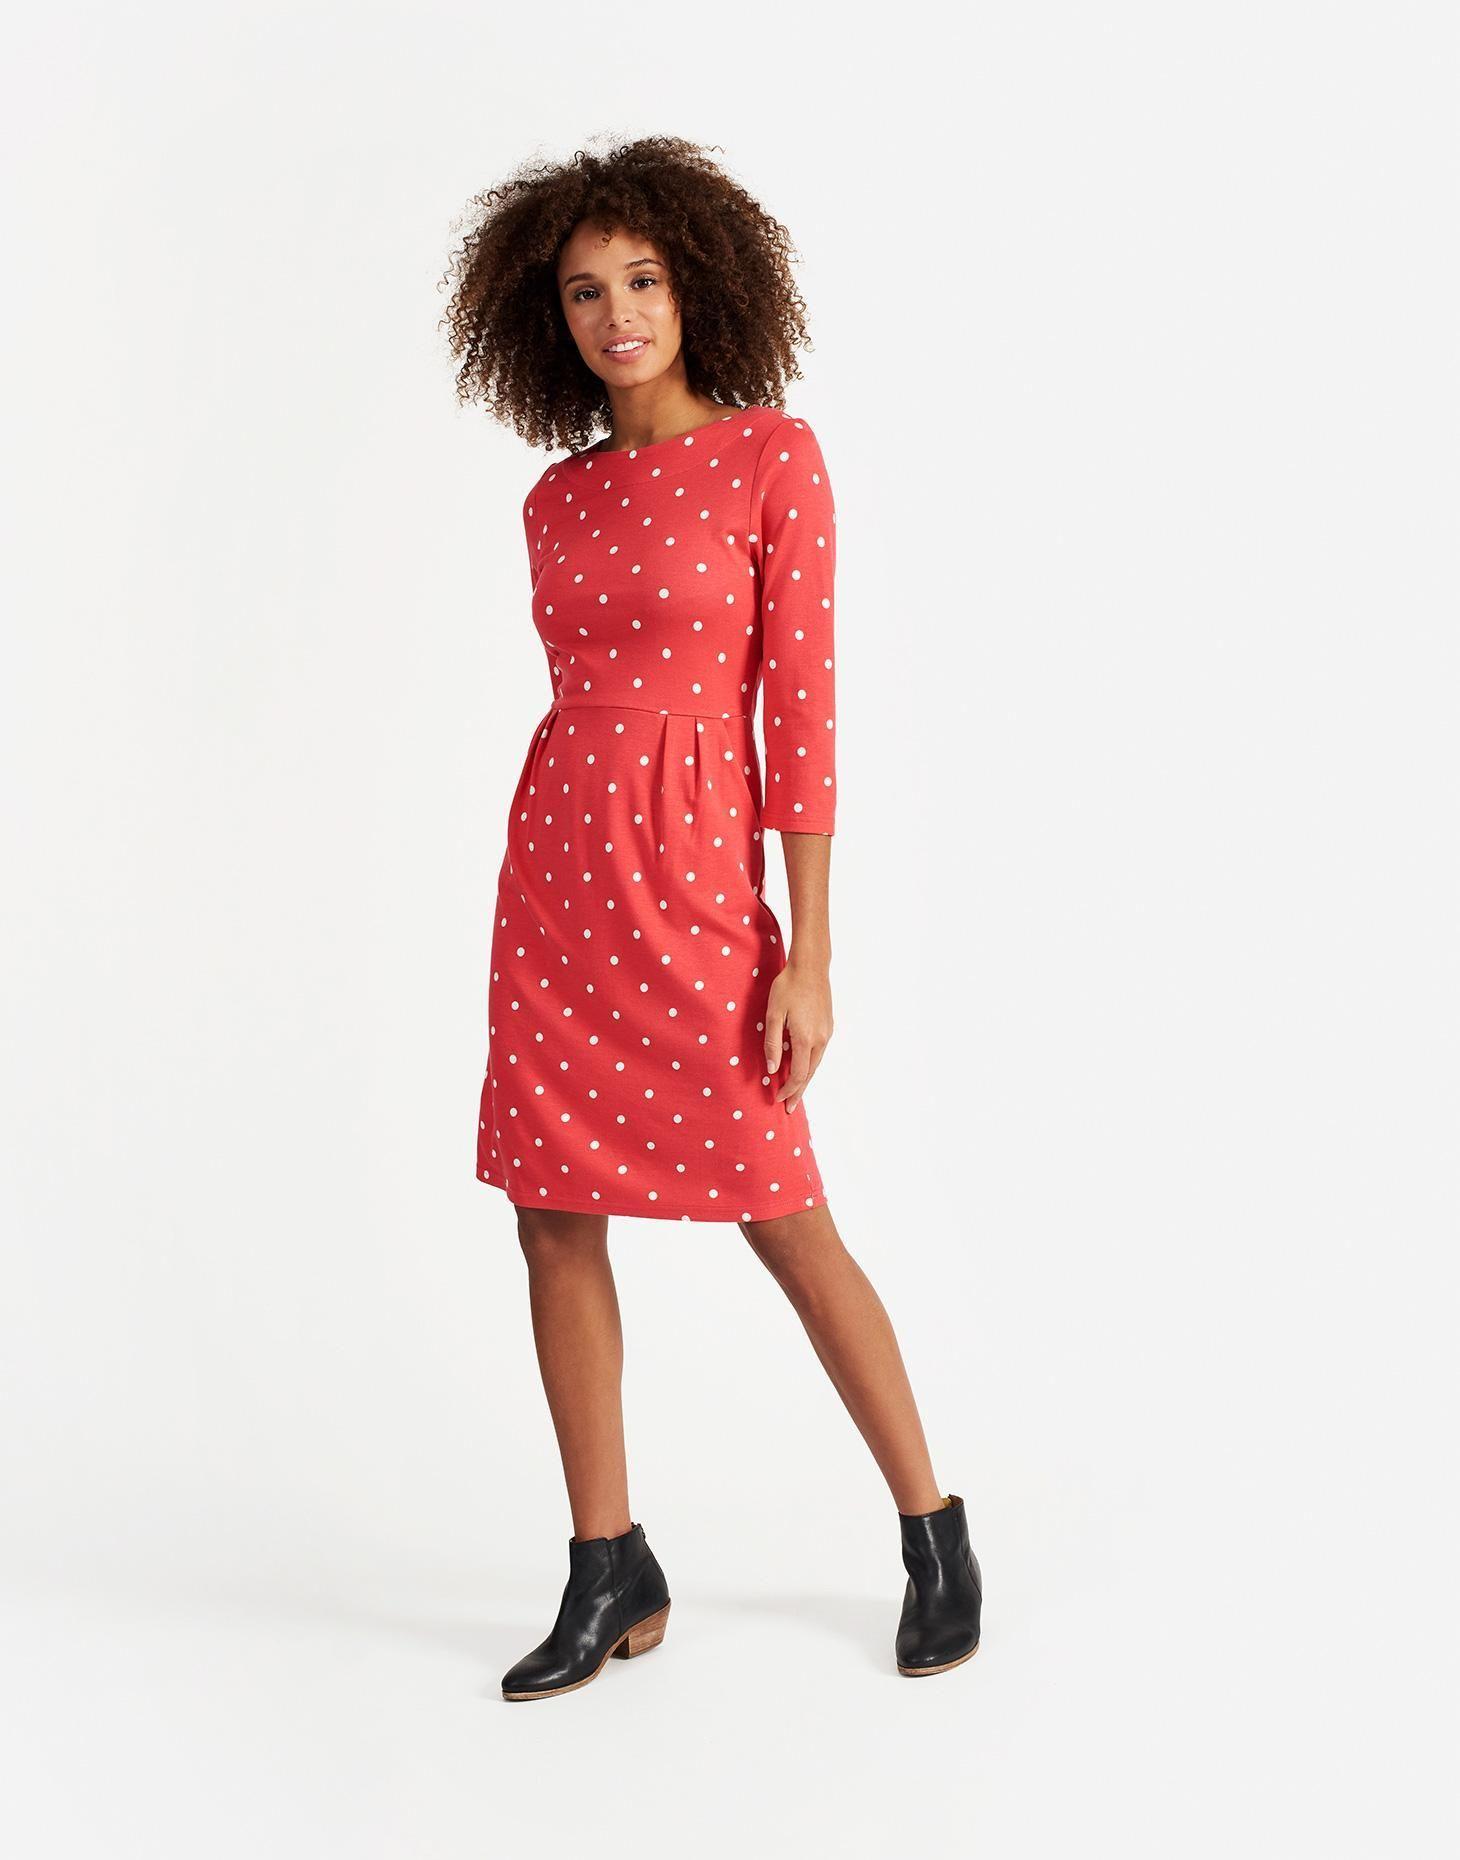 32db0fffc40 Long Jersey Dresses Uk